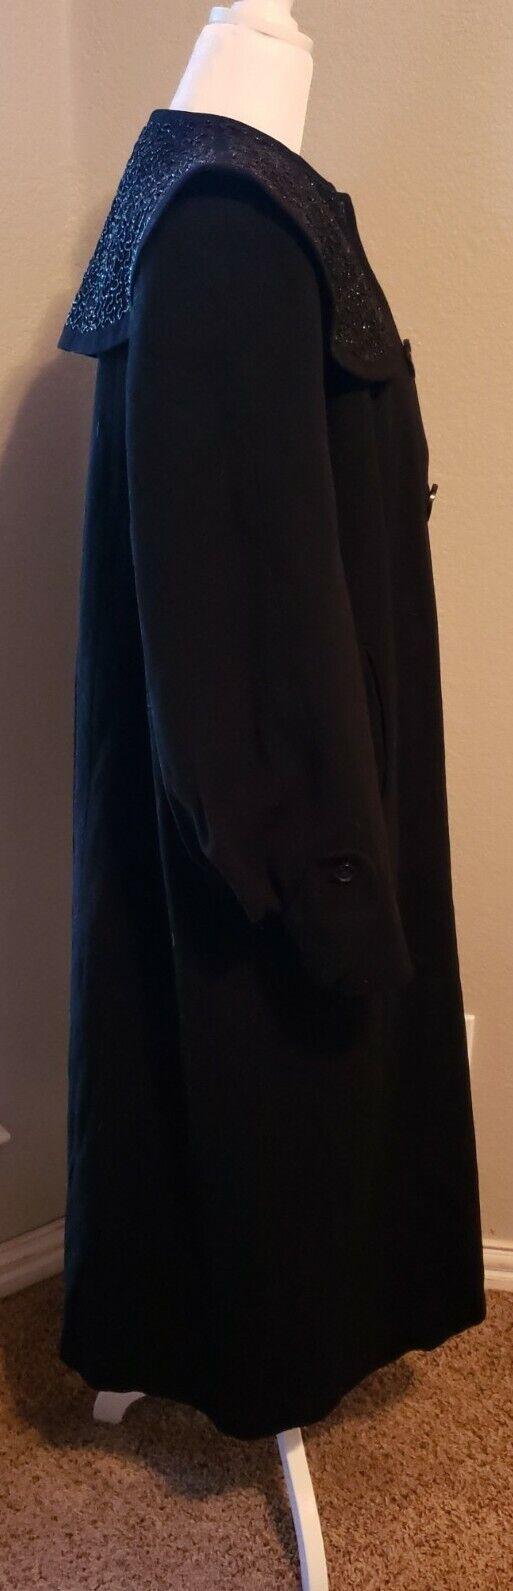 Vtg 40's 50's Mademoiselle Inc Wool Black Beaded … - image 6